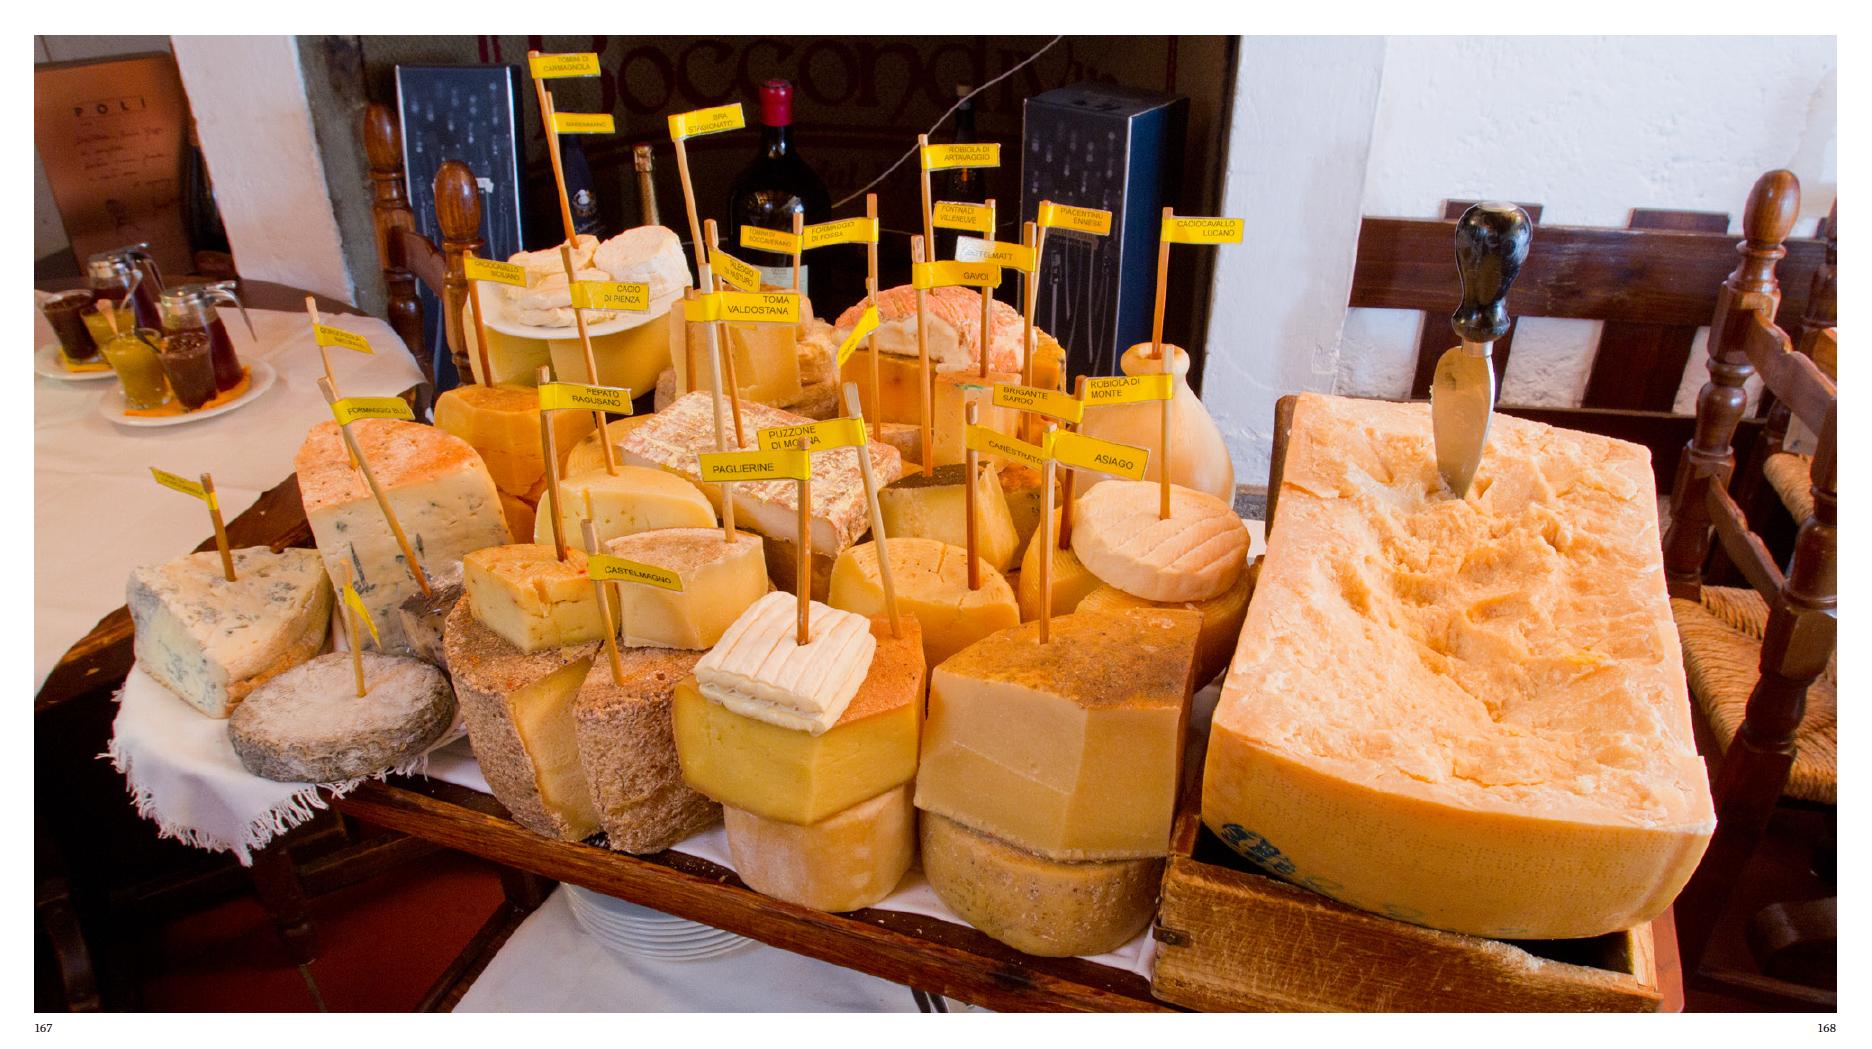 Cheese tray in Osteria Boccondivino, Milano, Italy